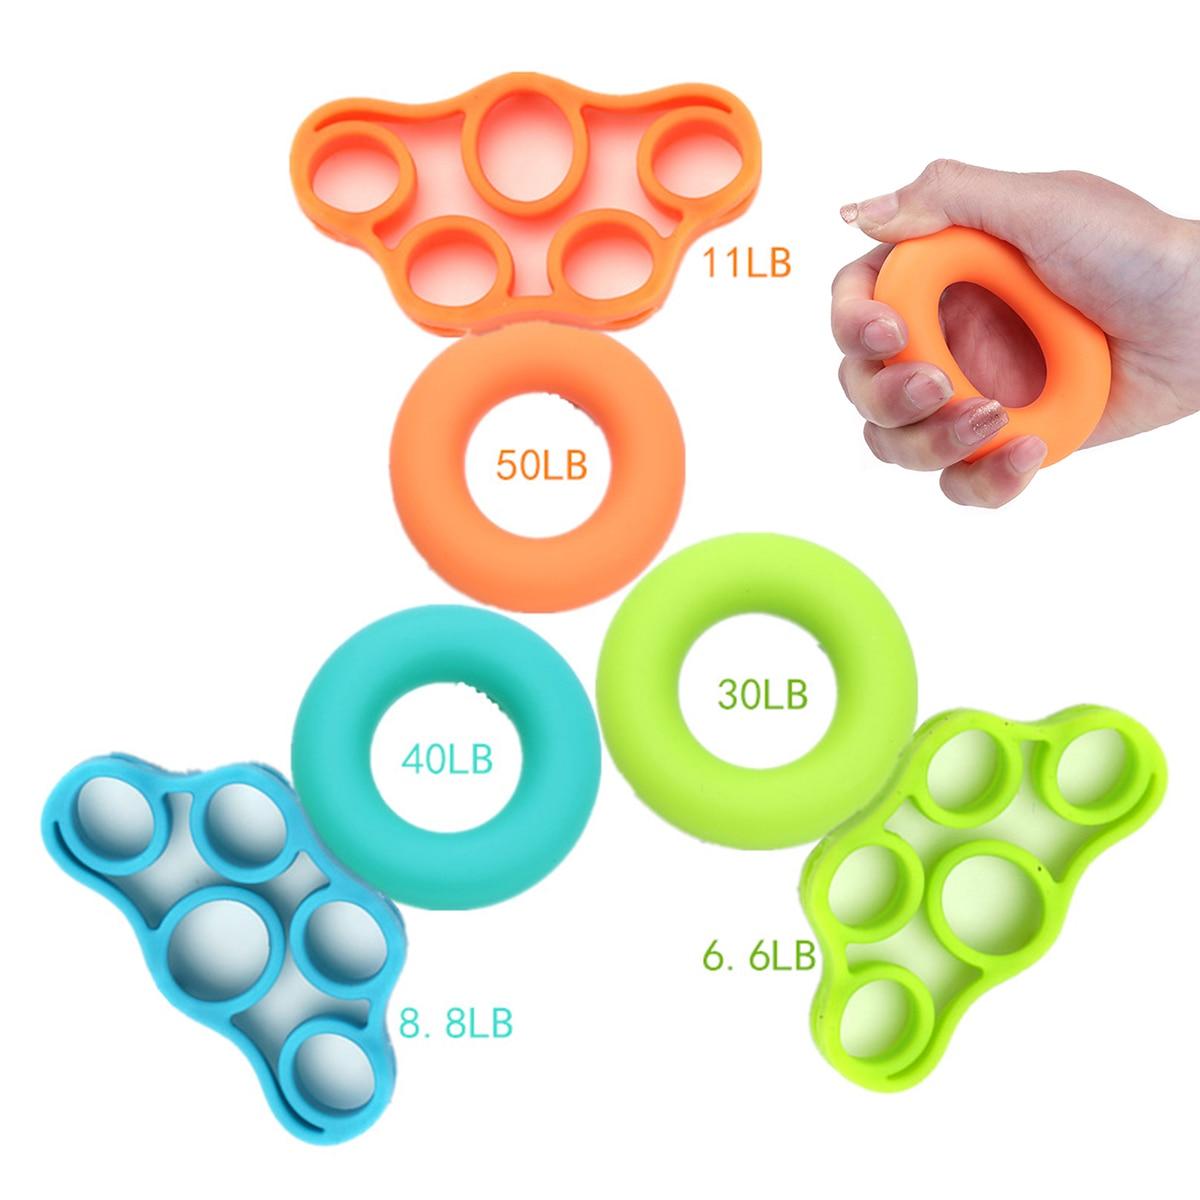 Mayitr 2Pcs/set Silicone Hand Grip Strengthener Finger Stretcher Hand Exercise Gym Fitness Grip Finger Trainer Ring